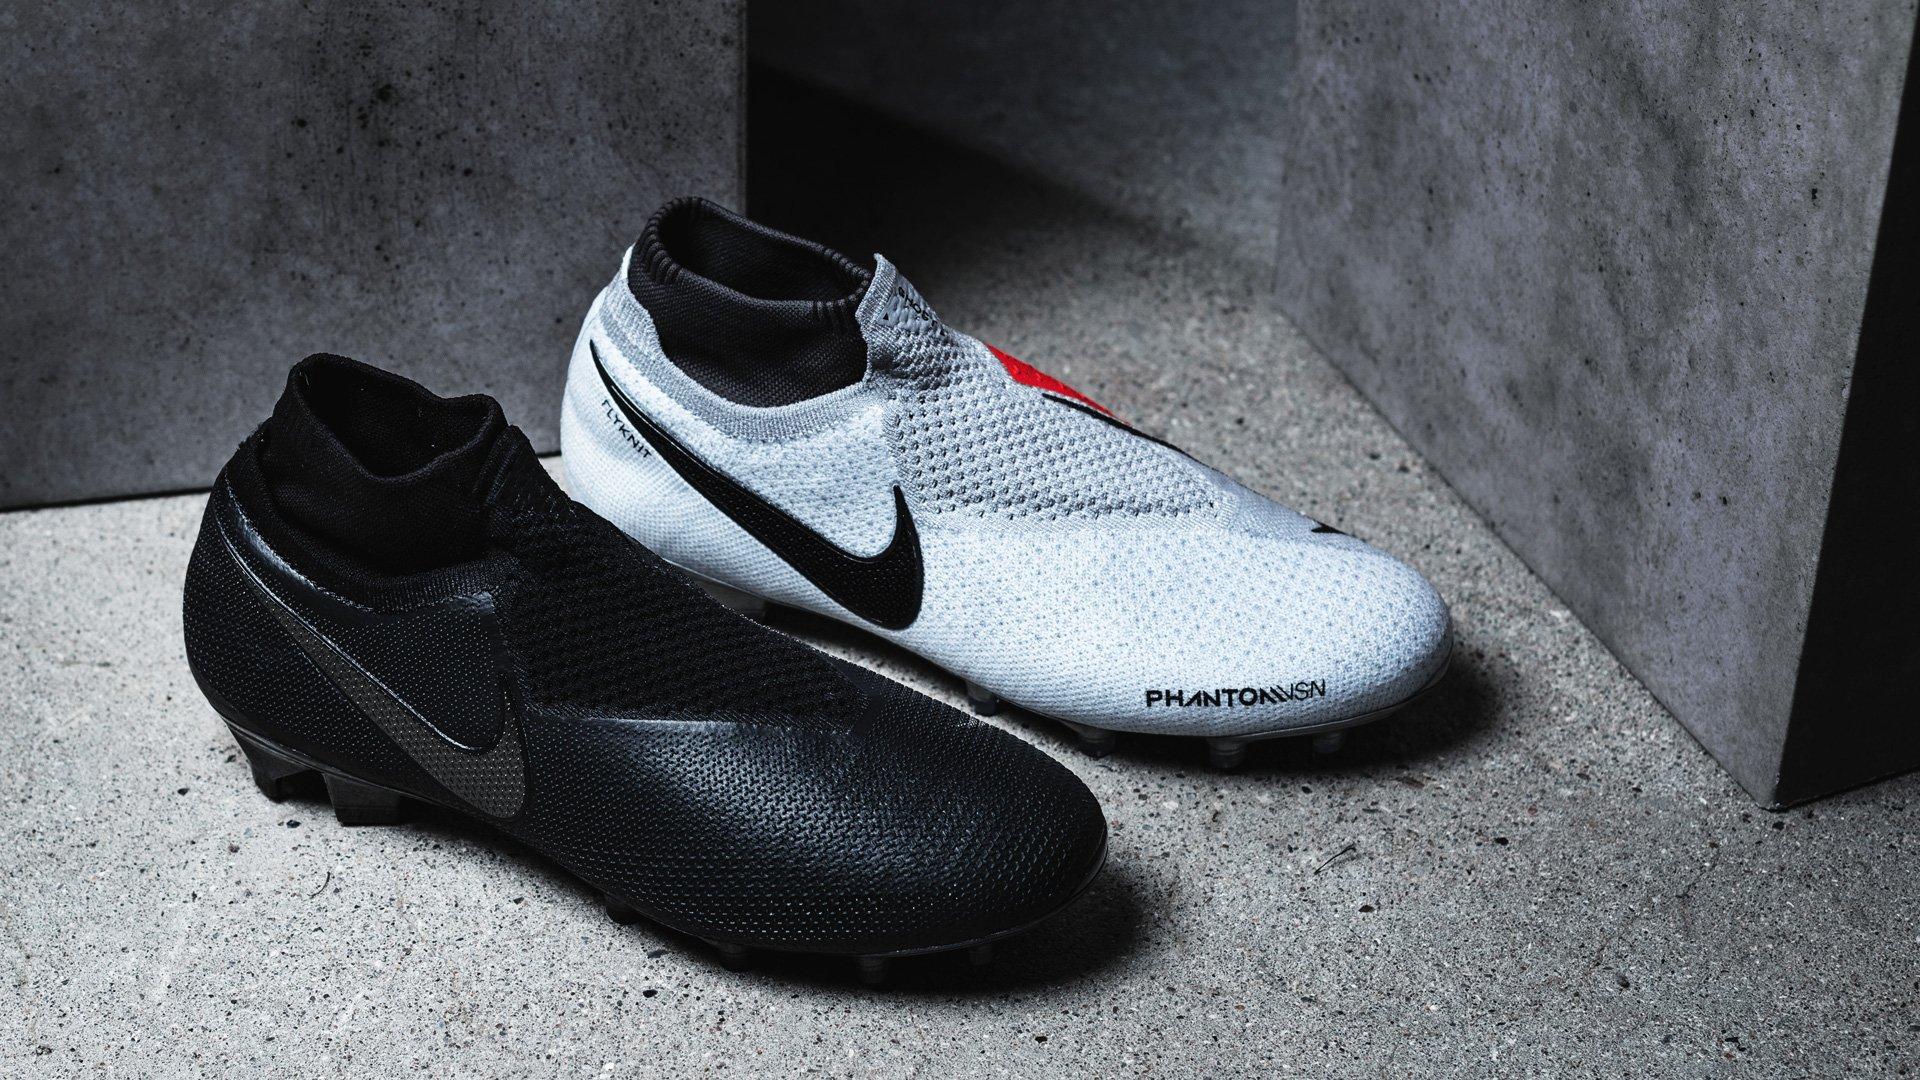 le dernier 7fddd 5d2ed Nike PhantomVSN, la nouvelle chaussure de Nike Football ...